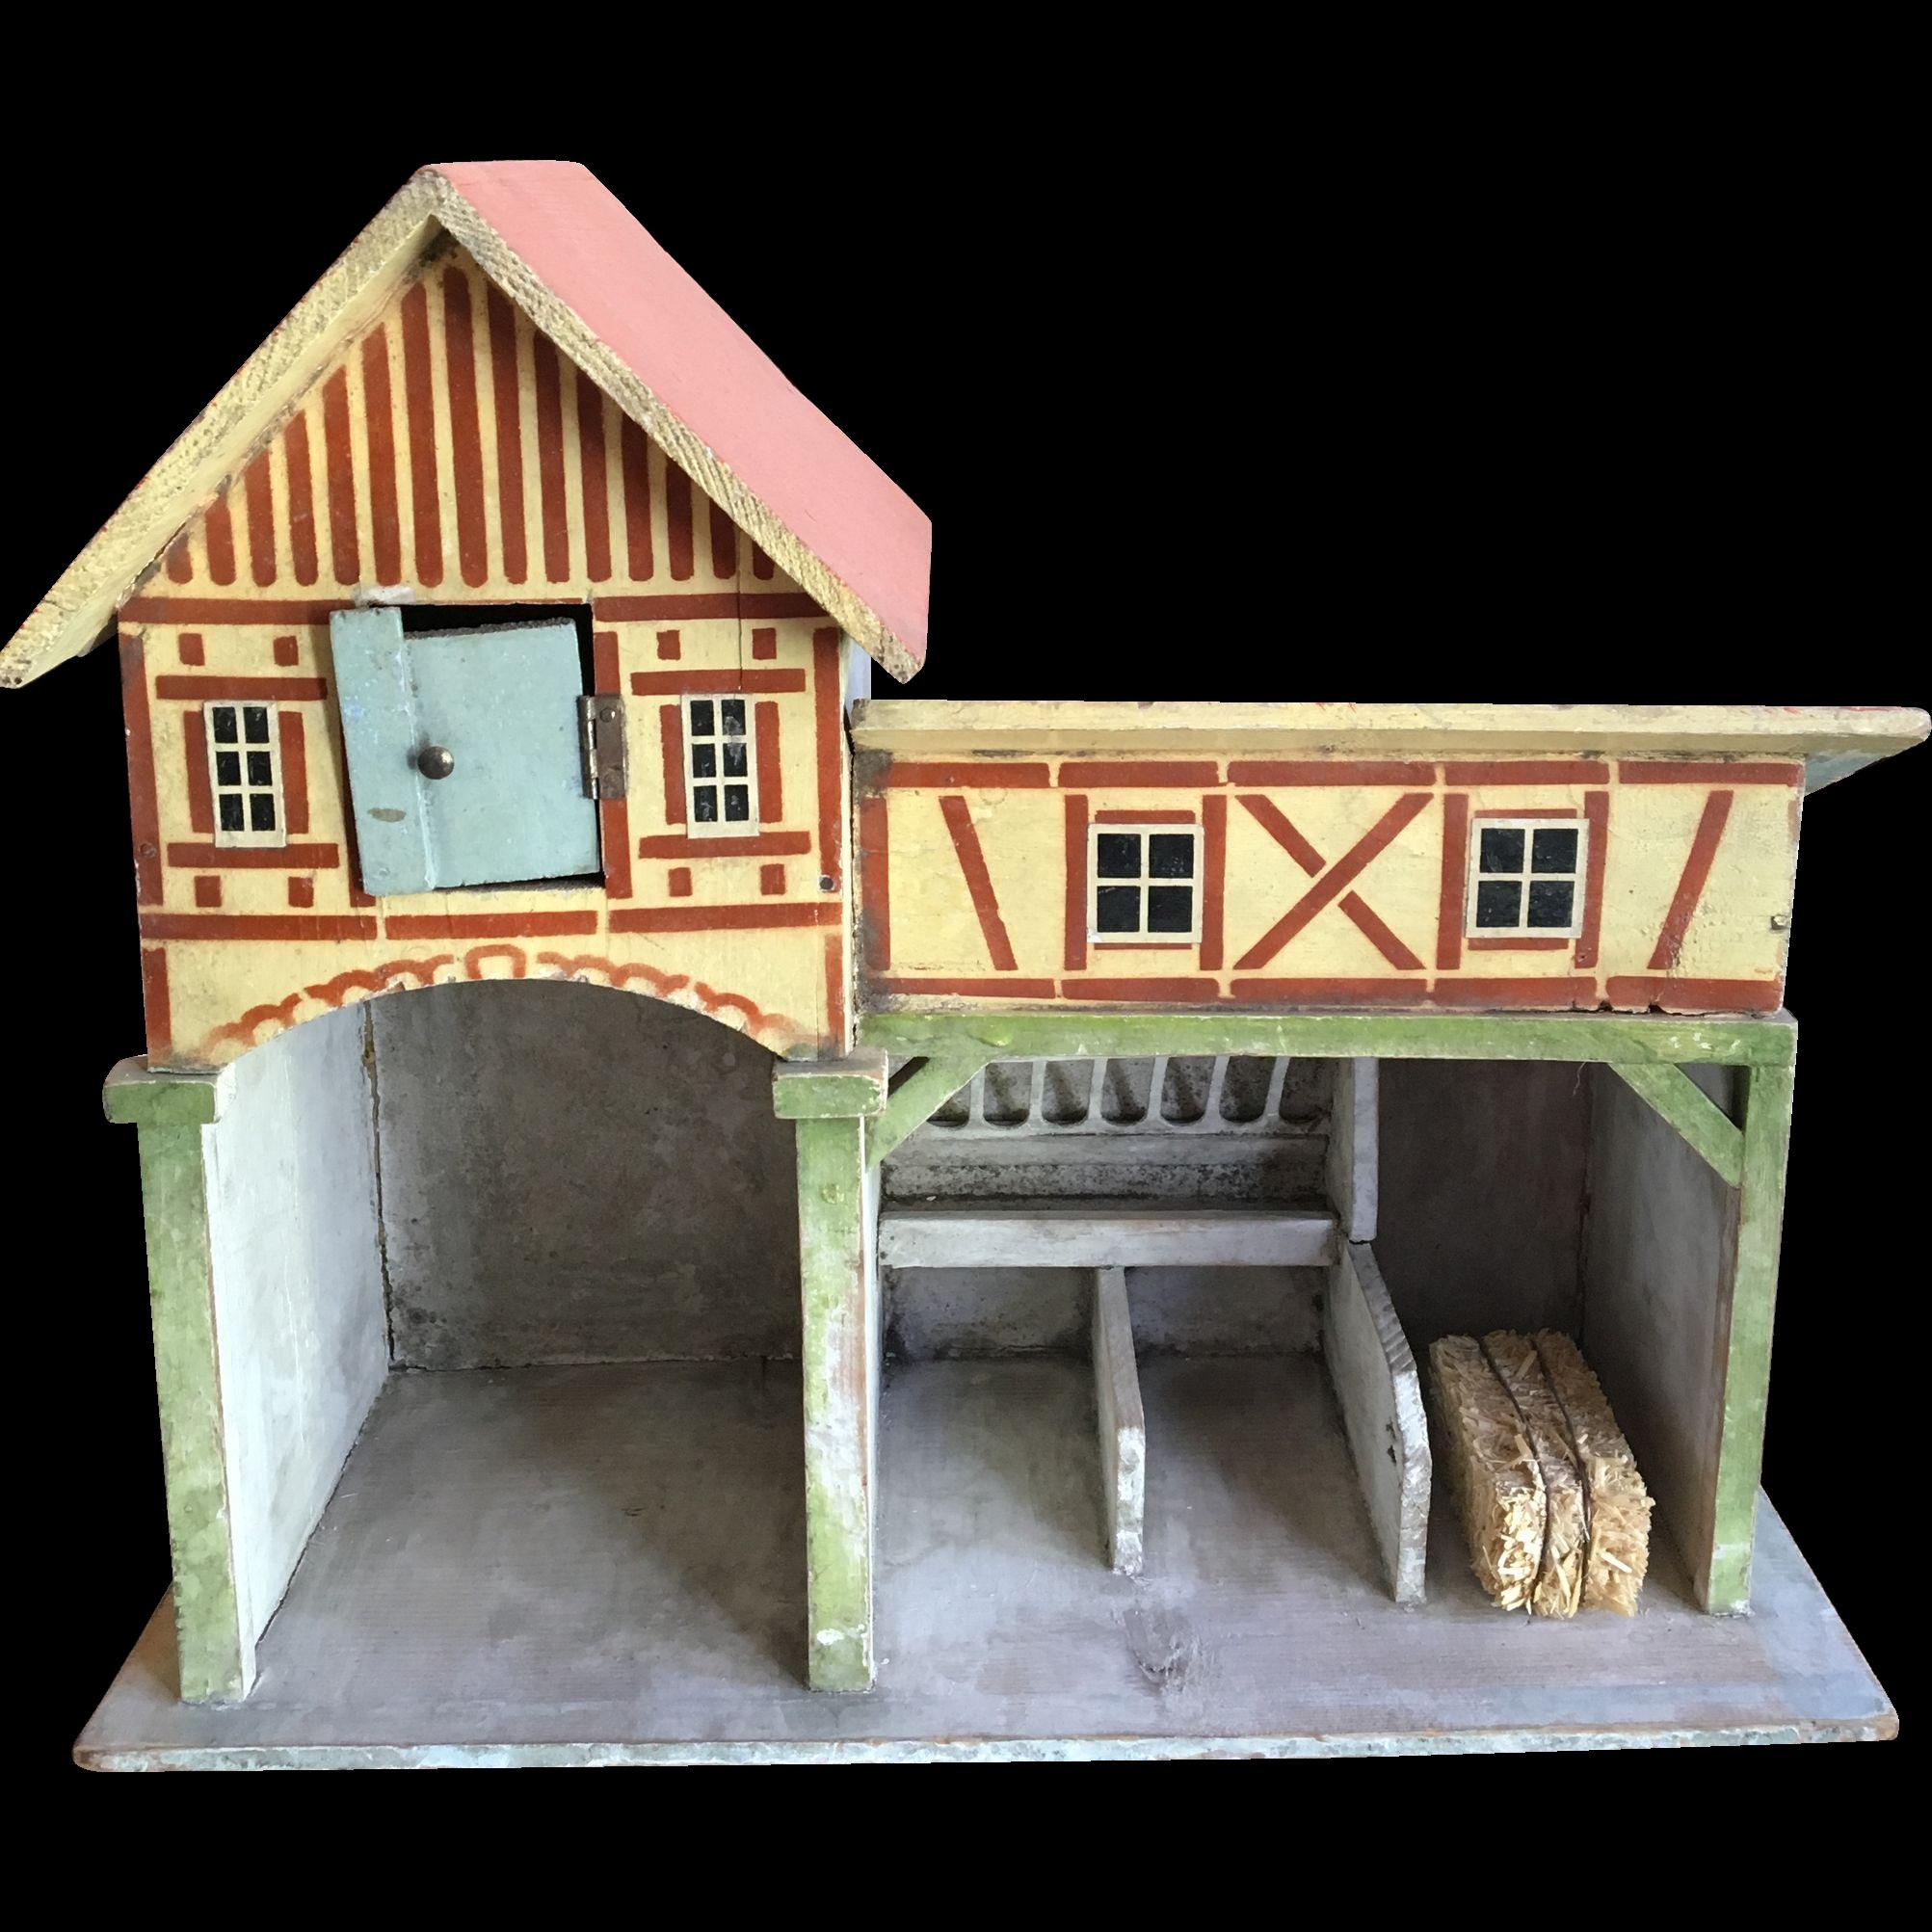 Erzgebirge Doll house Barn and Stable Farm : Antiquefreak ...